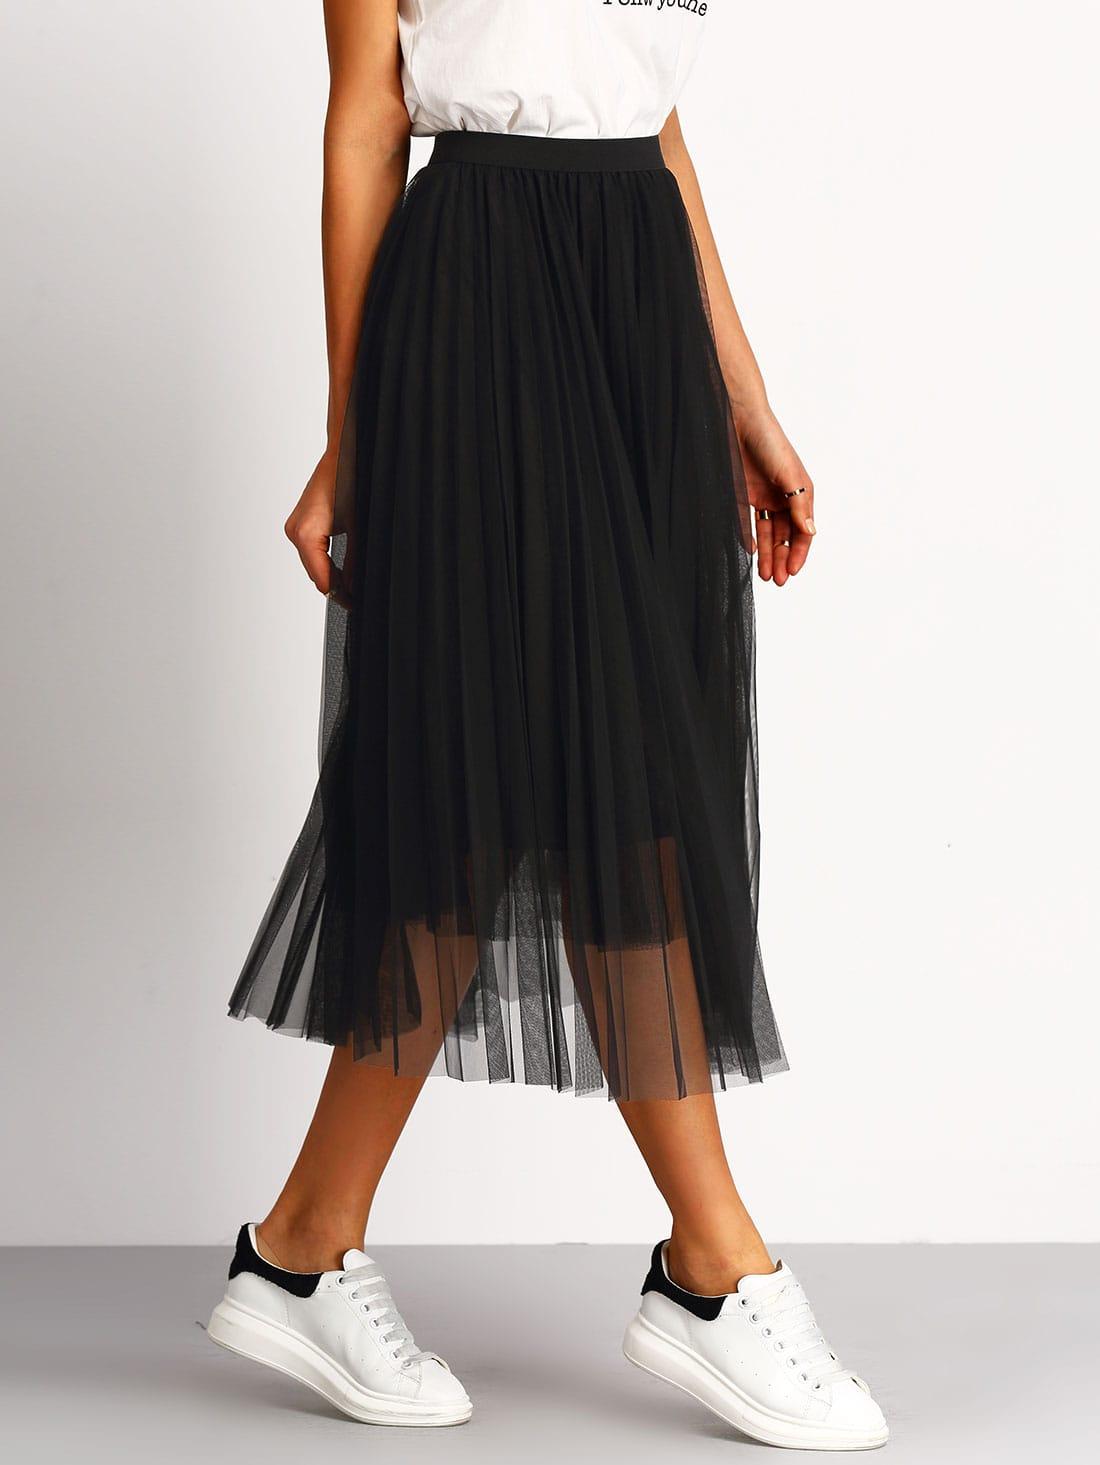 jupe taille lastique pliss noir french romwe